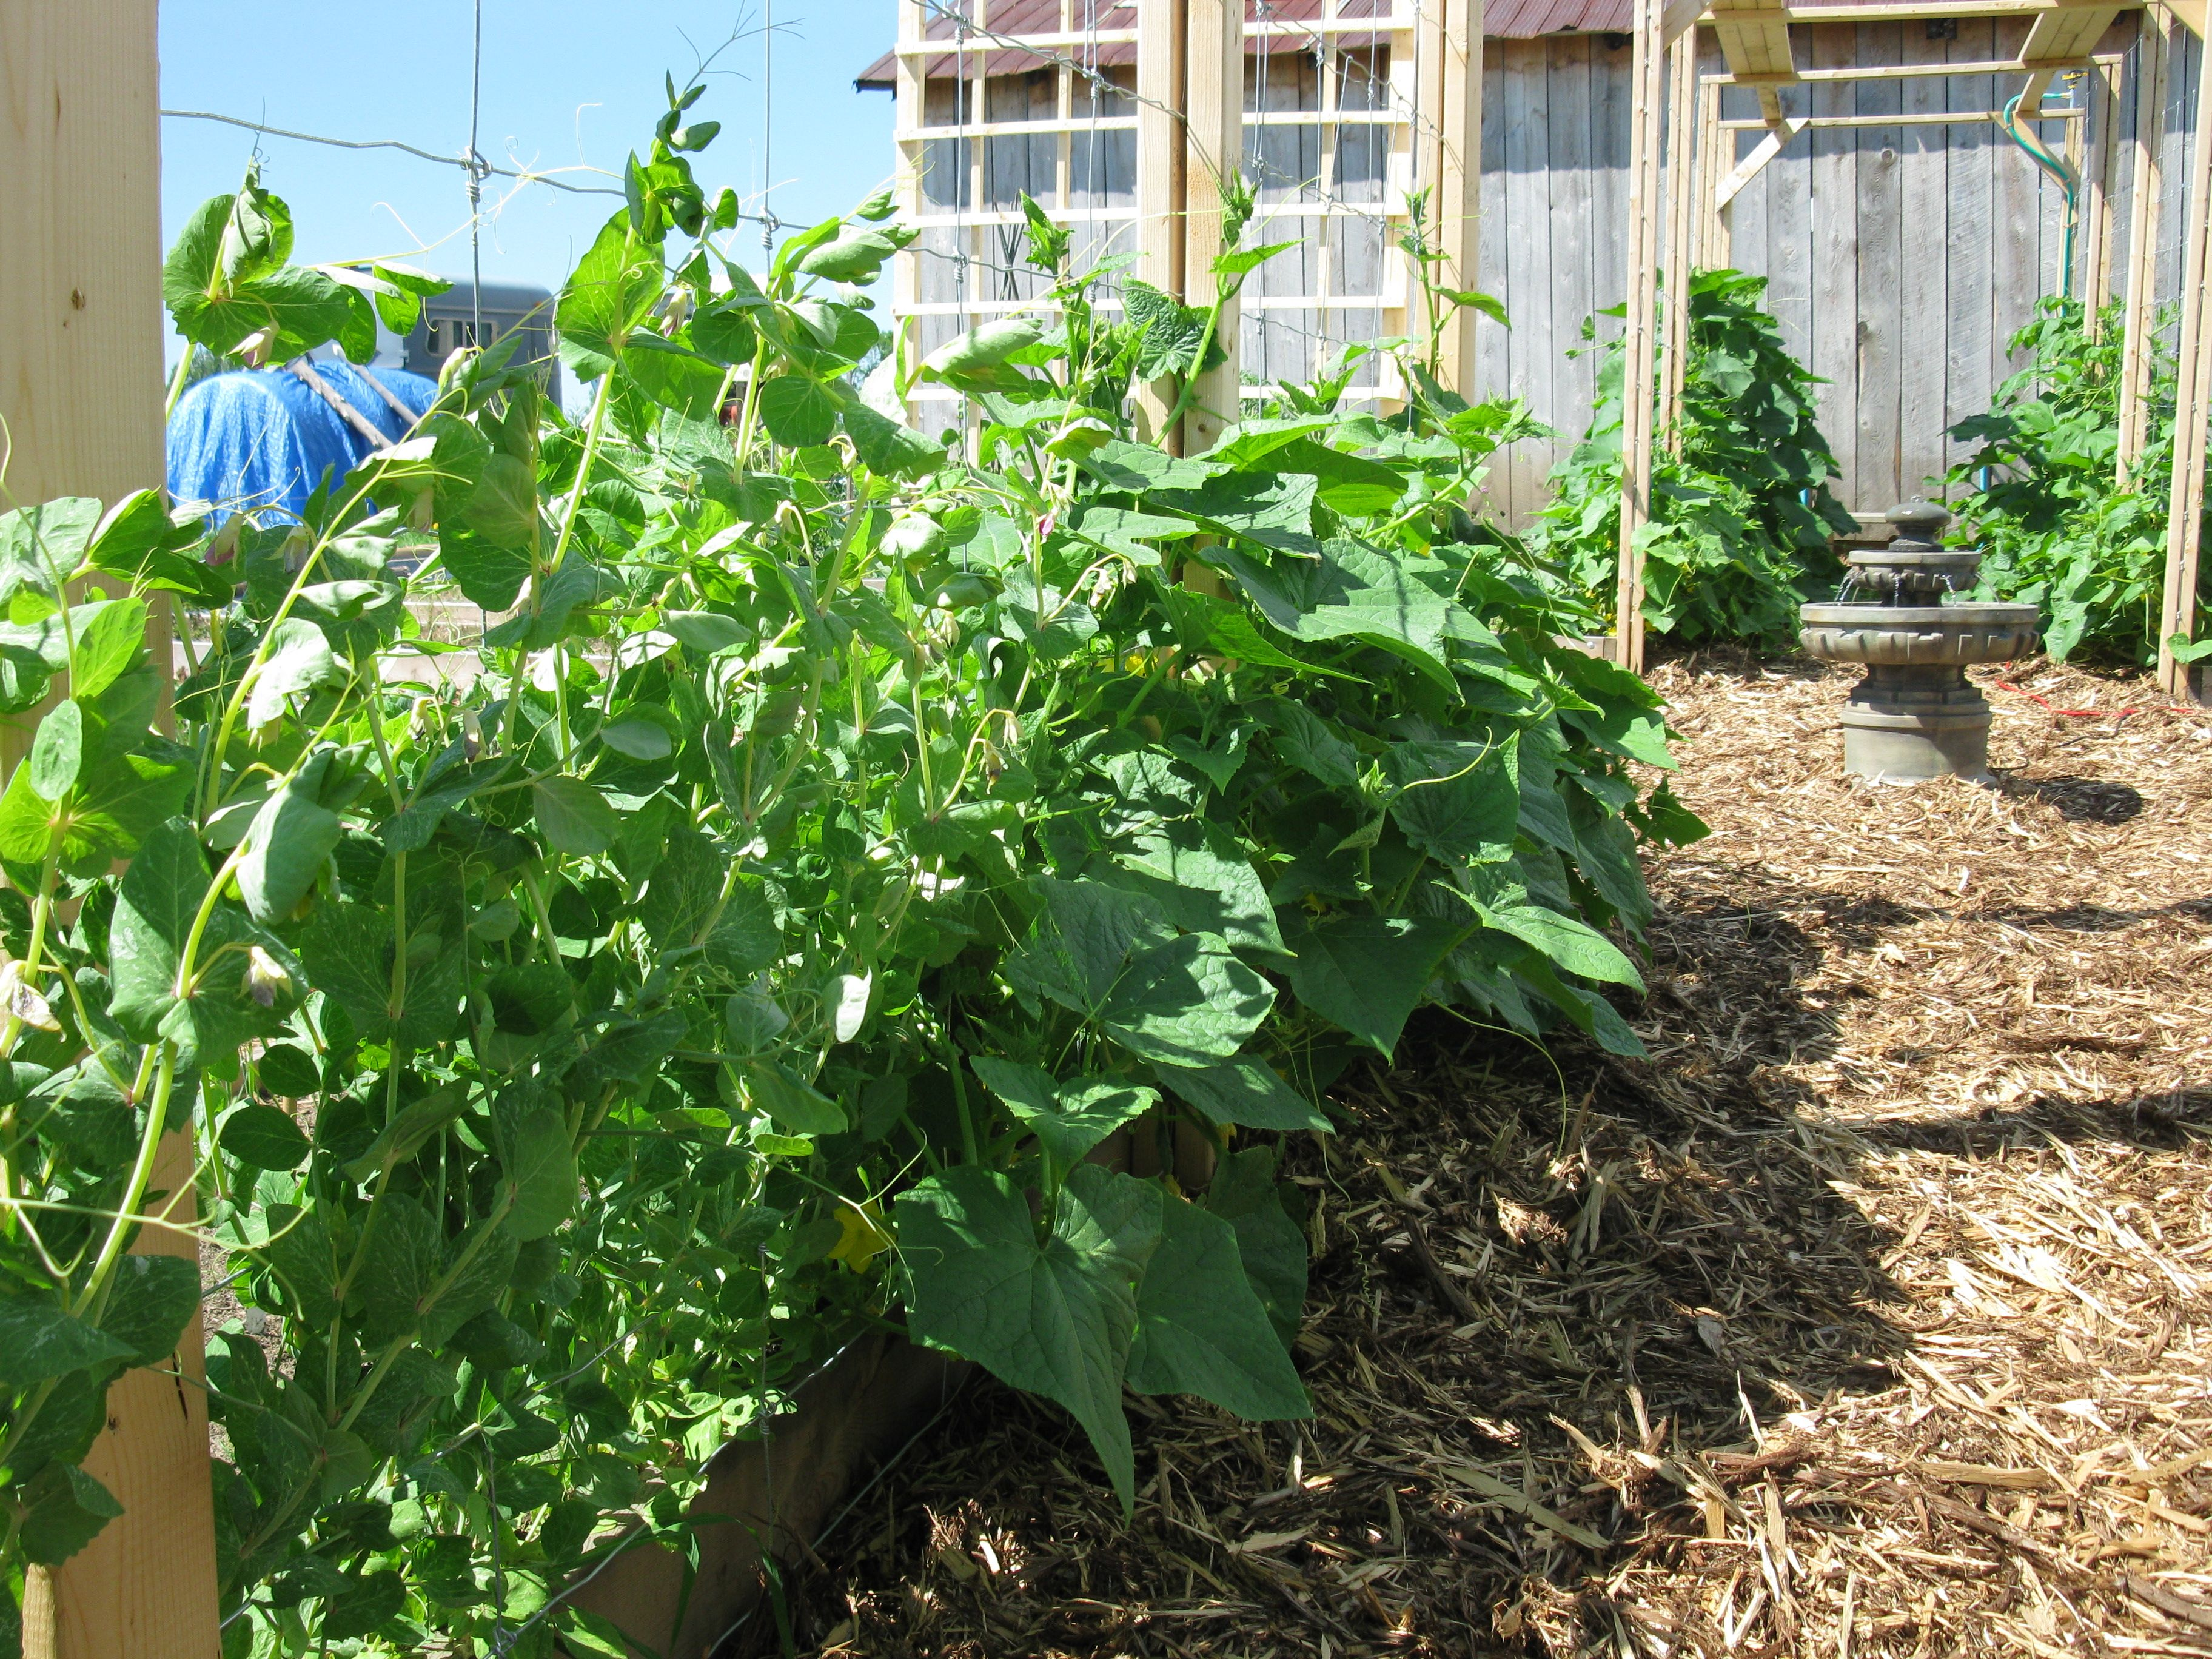 Growing an Organic Vertical Vegetable Garden on Trellis to Avoid Weeding.